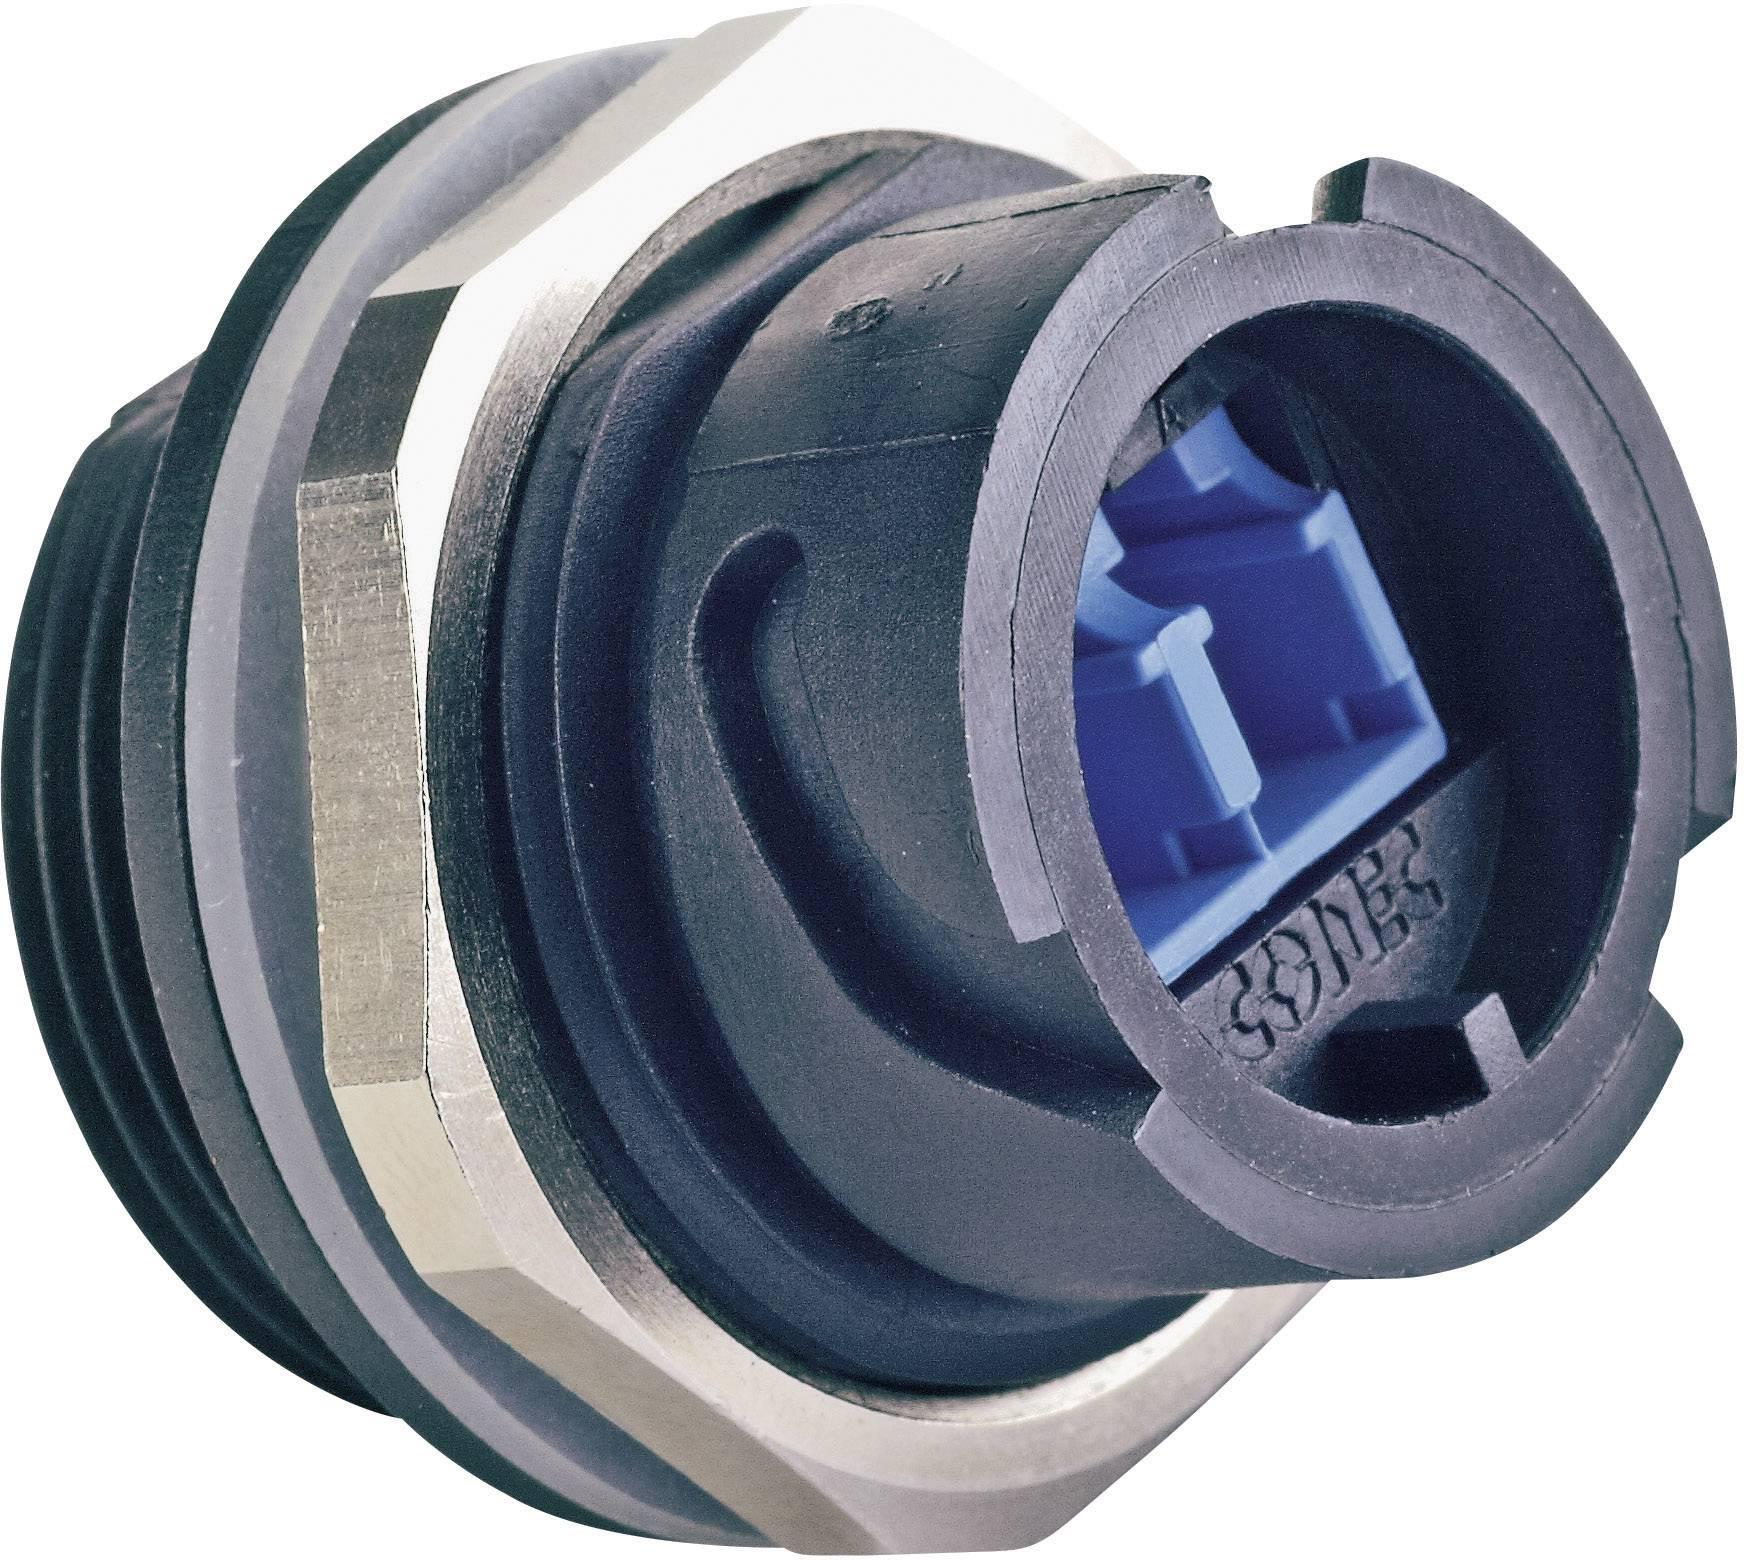 Konektor optických vláken IP67 Conec, 17-300230